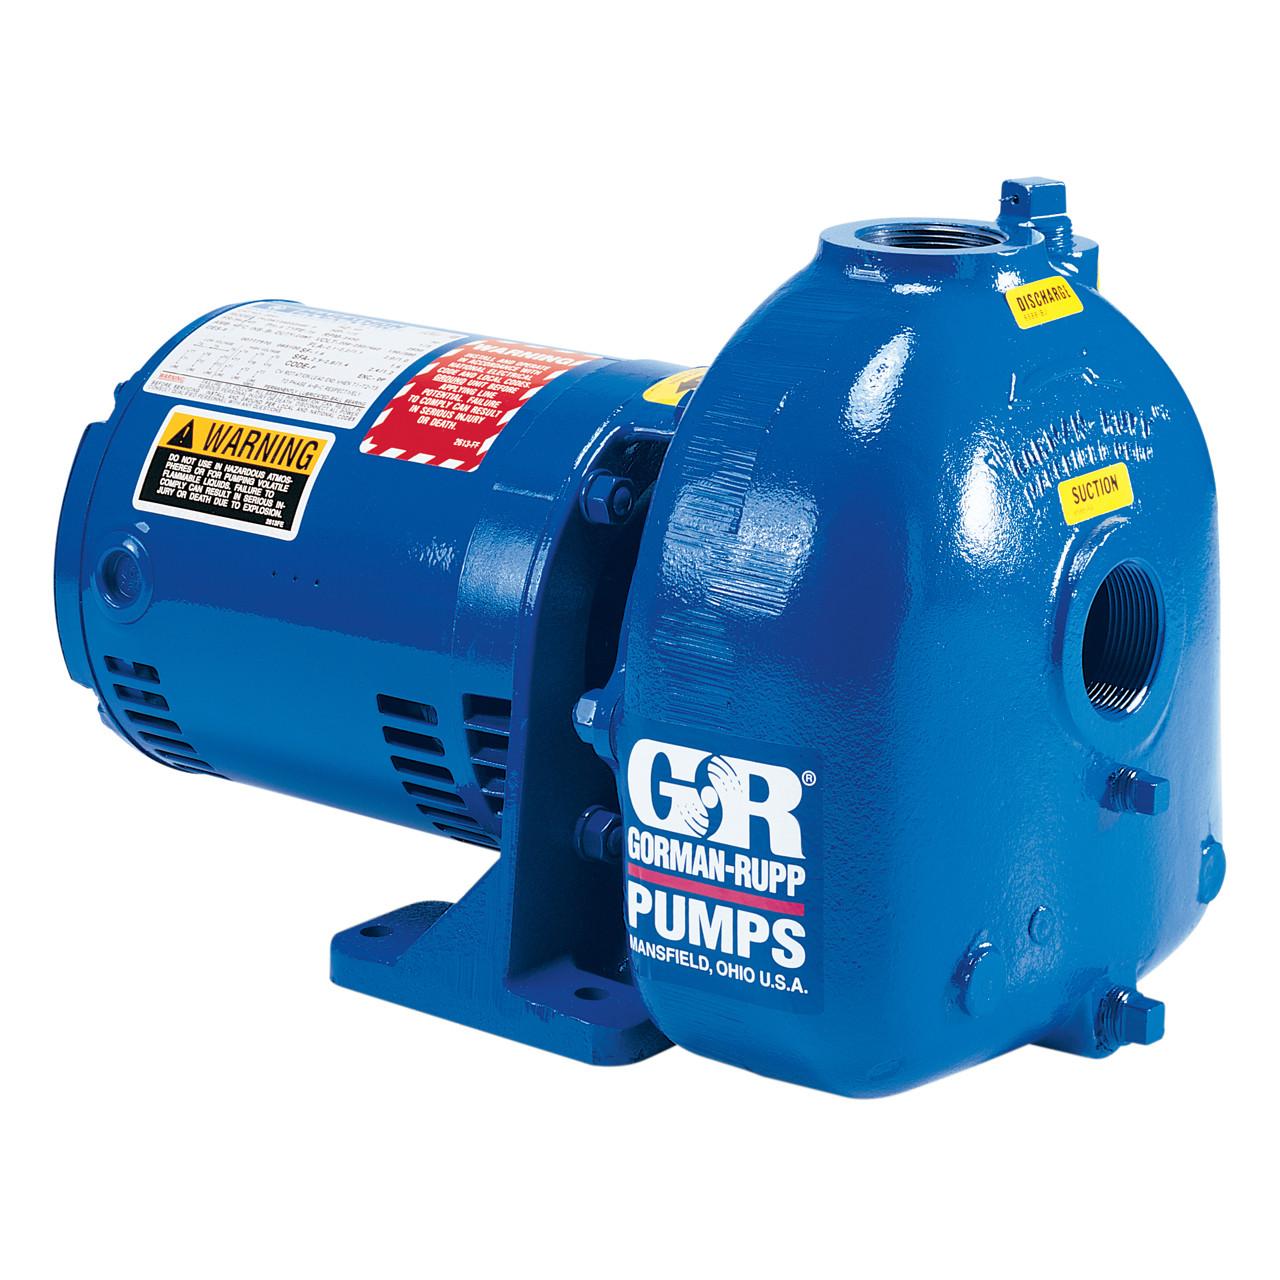 AMT/Gorman Rupp Cast Iron 1 1/2 in  1 HP Self-Priming 3450 RPM Centrifugal  Flammable Liquids Pumps